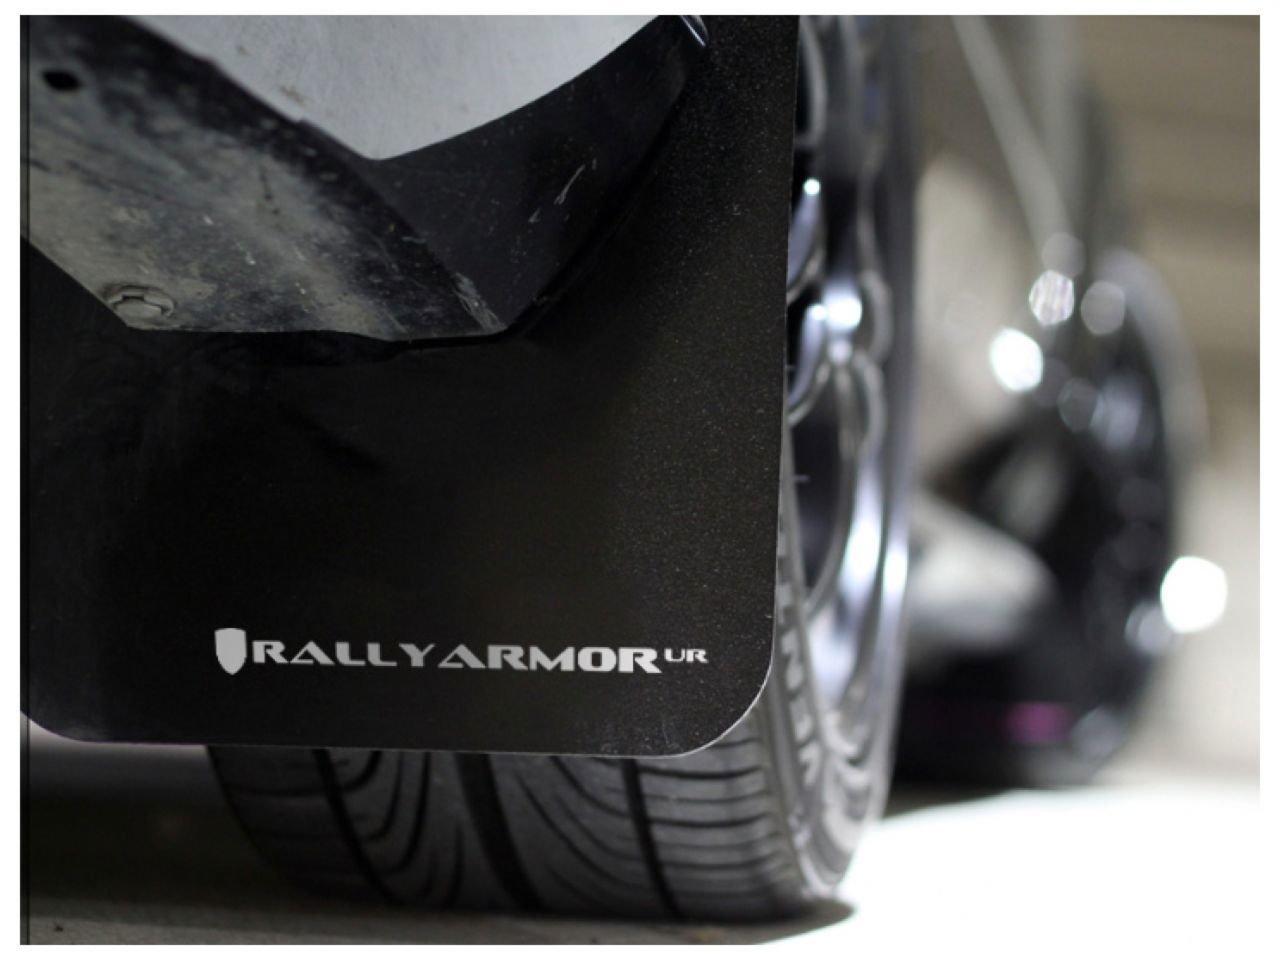 12+ Subaru Impreza 5dr Hatch//4dr Sedan UR Rally Armor MF22-UR-BLK//WH Black White Mud Flap with Logo